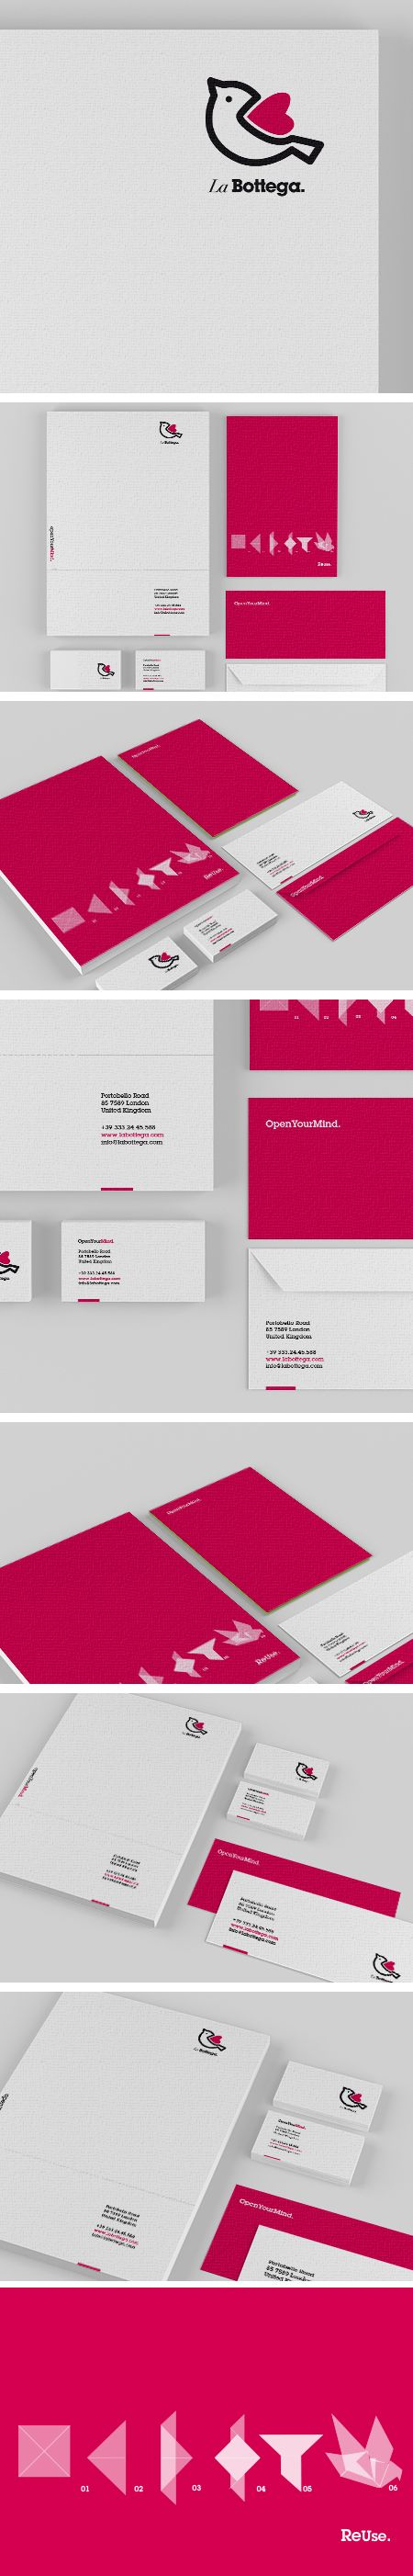 © Valentina De Laurentis | #stationary #corporate #design #corporatedesign #logo #identity #branding #marketing <<< repinned by an #advertising agency from #Hamburg / #Germany -